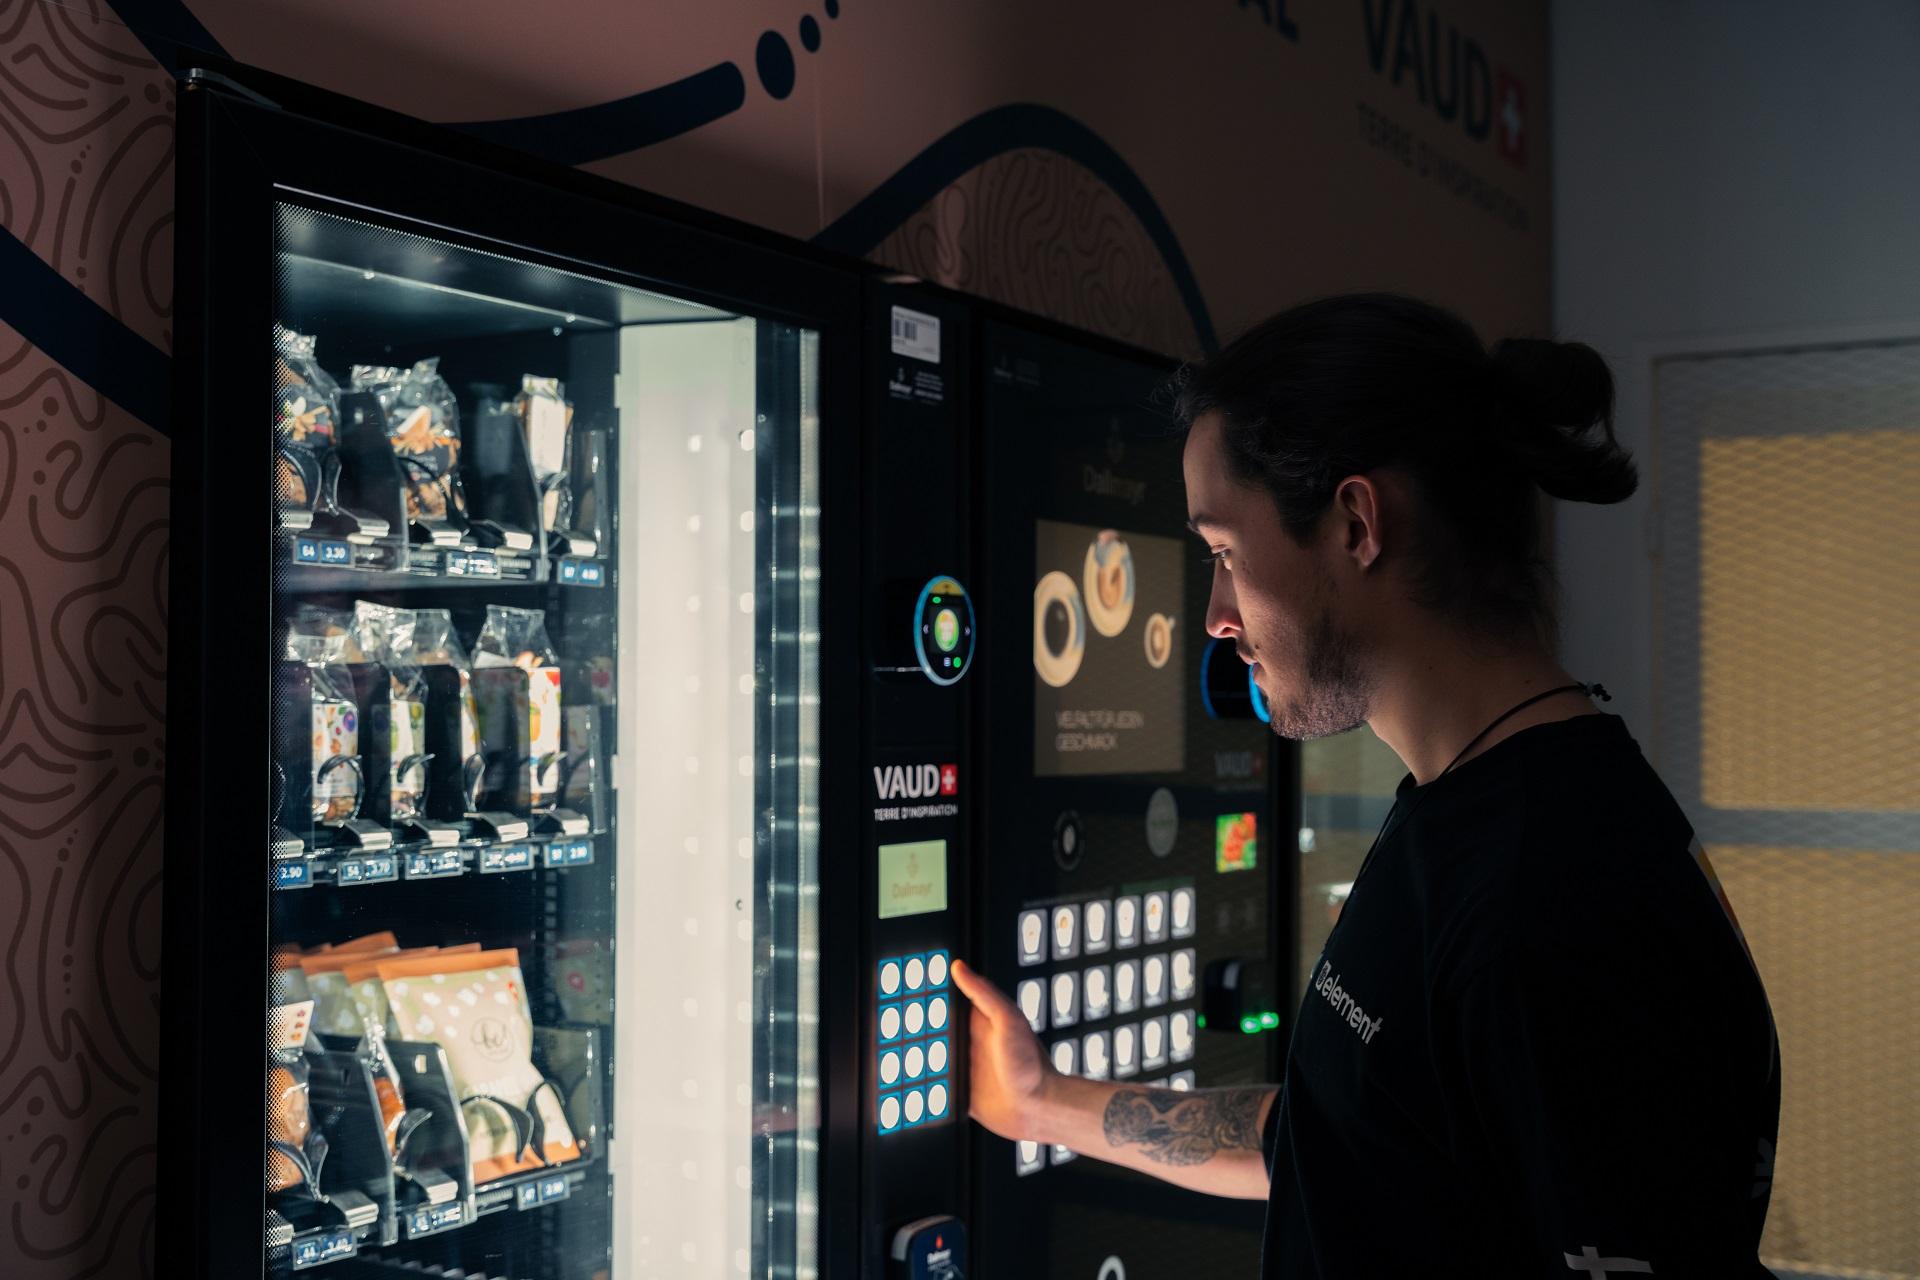 Lokal statt global: Dallmayr lanciert Innovation in der Westschweiz_Vaud-plus_cmm360